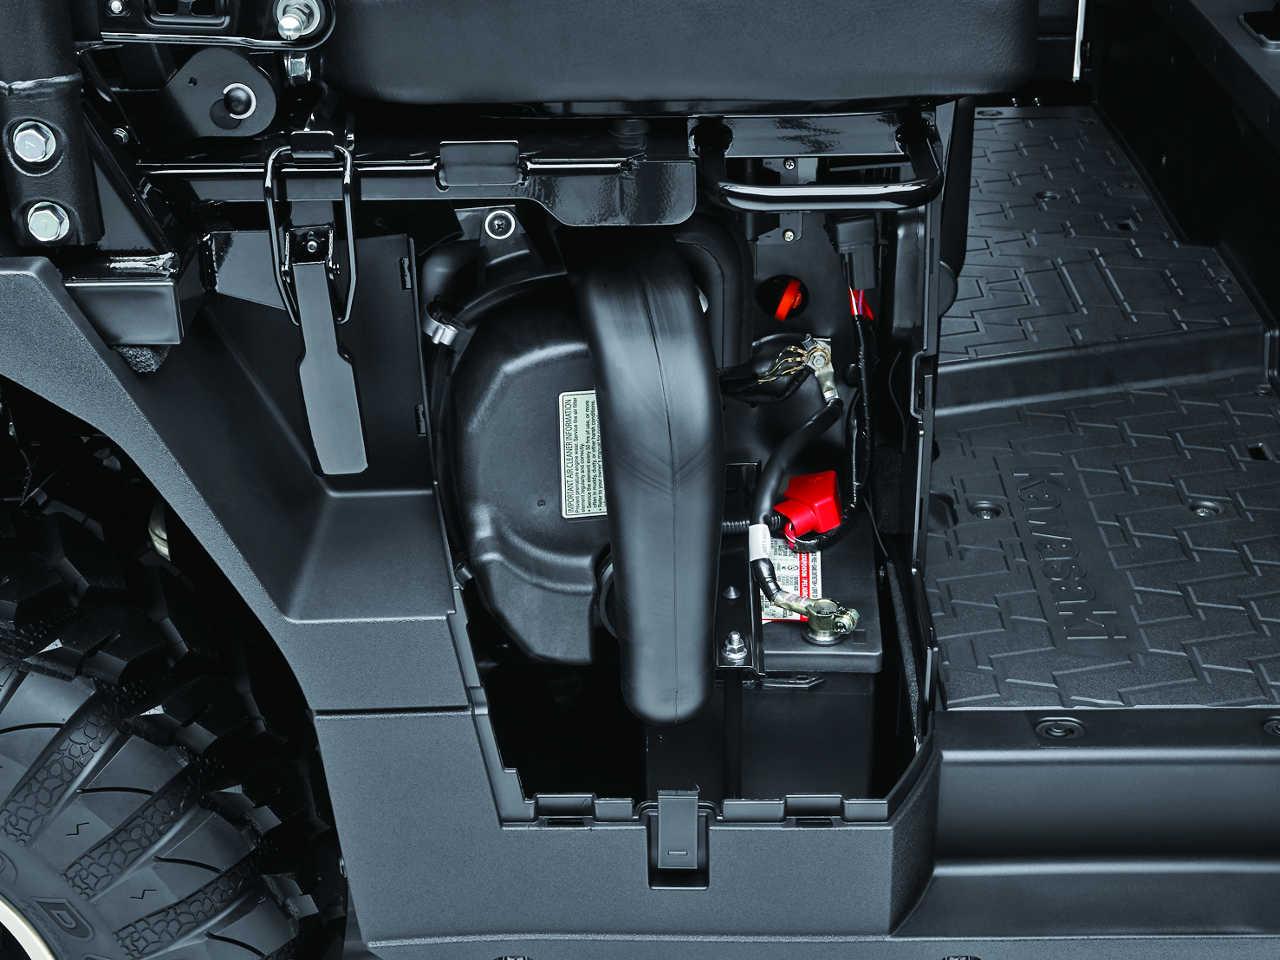 hight resolution of honda atv 300 4x4 engine diagram honda get free image kawasaki mule wiring diagram mule electrical wiring